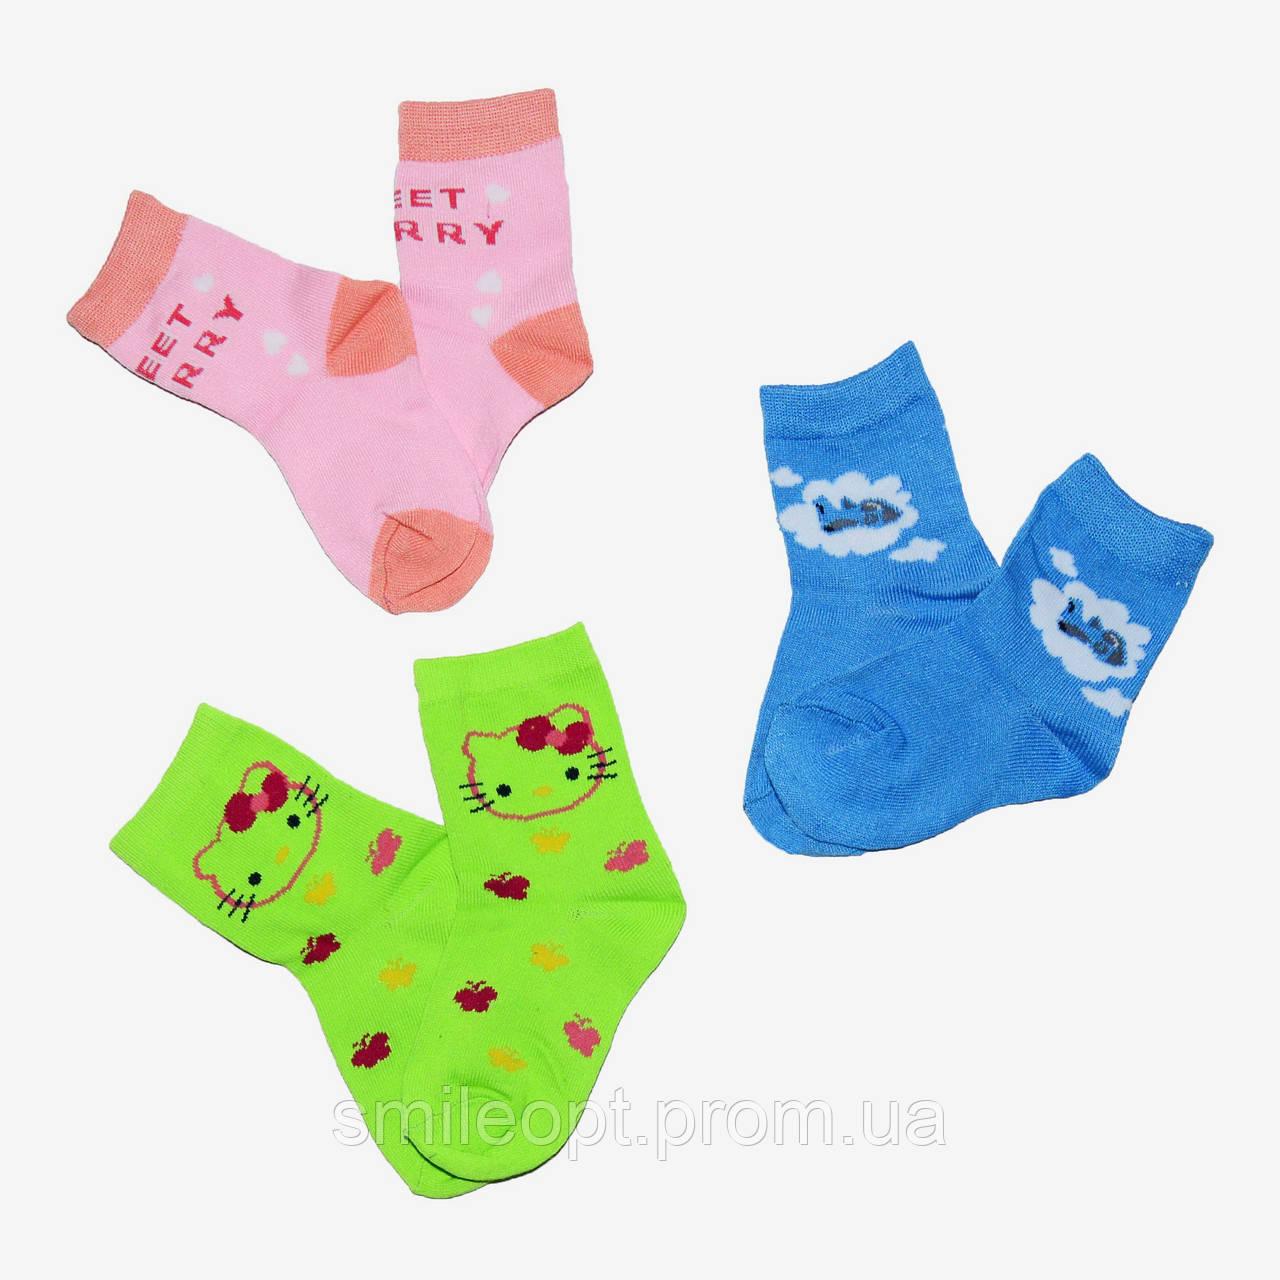 206876f1c16c4 Детские носки